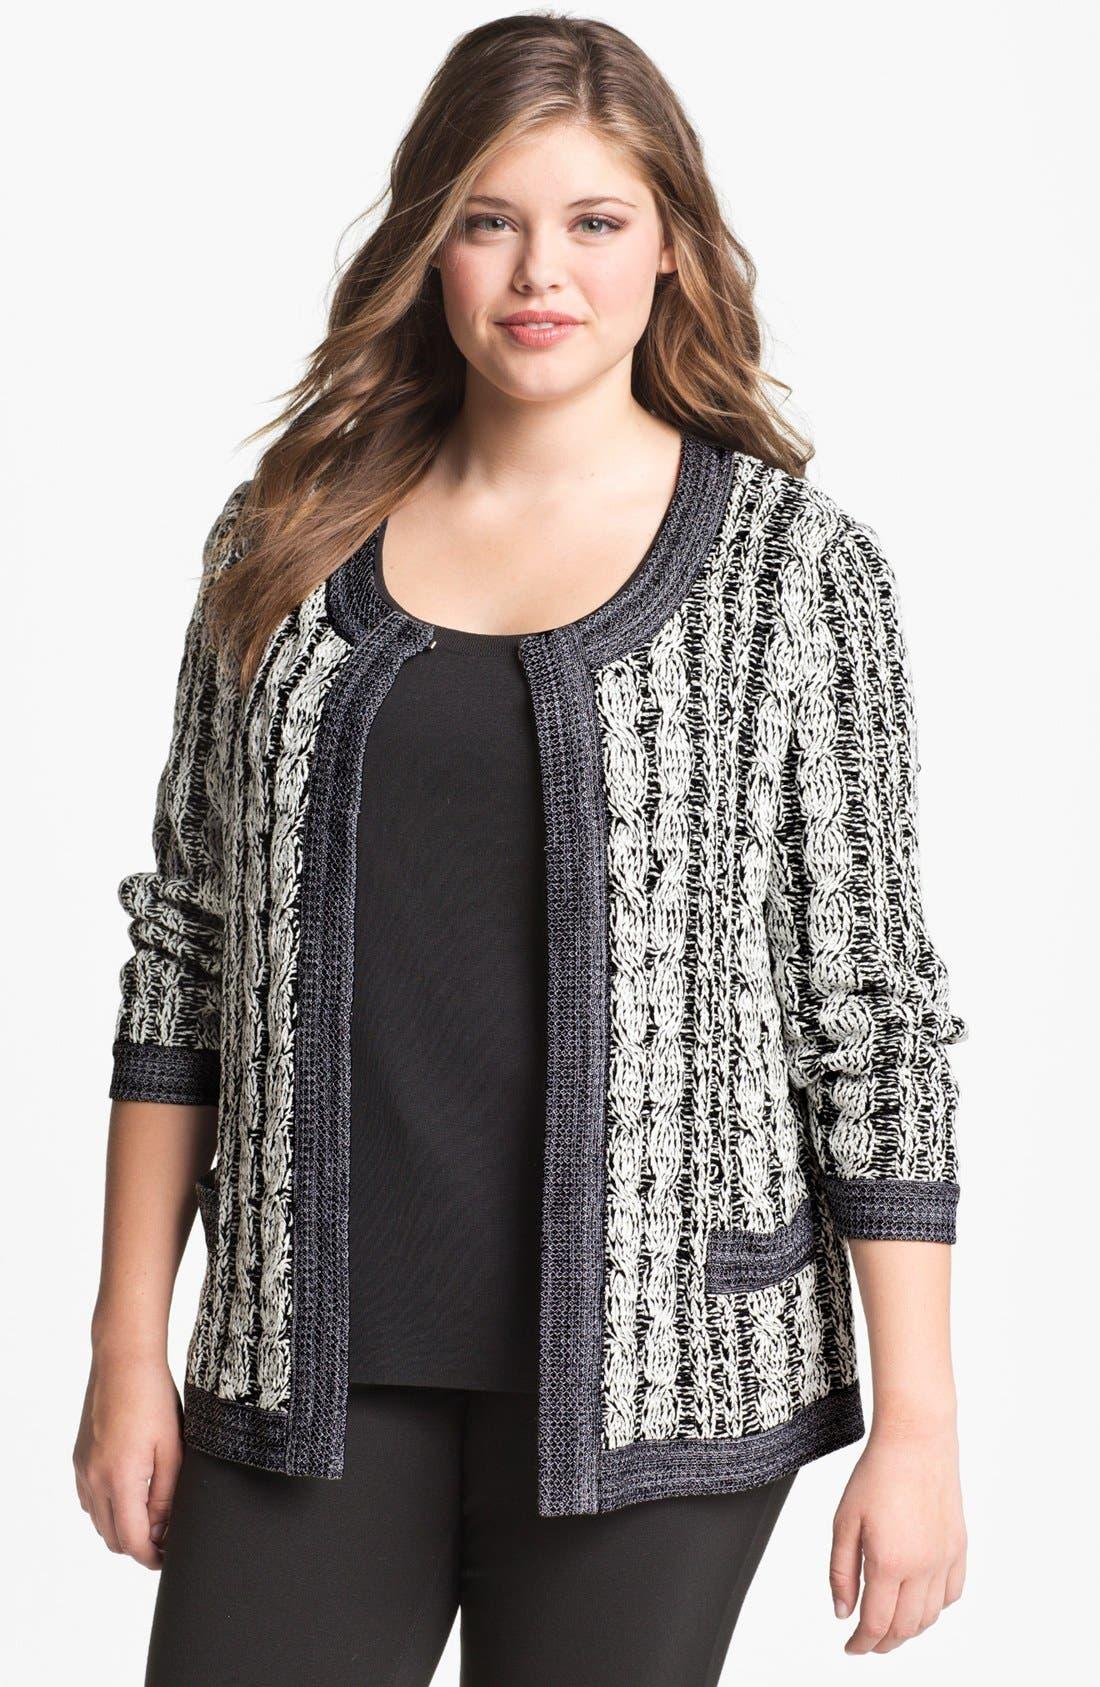 Main Image - Exclusively Misook 'Rena' Sweater Jacket (Plus Size)